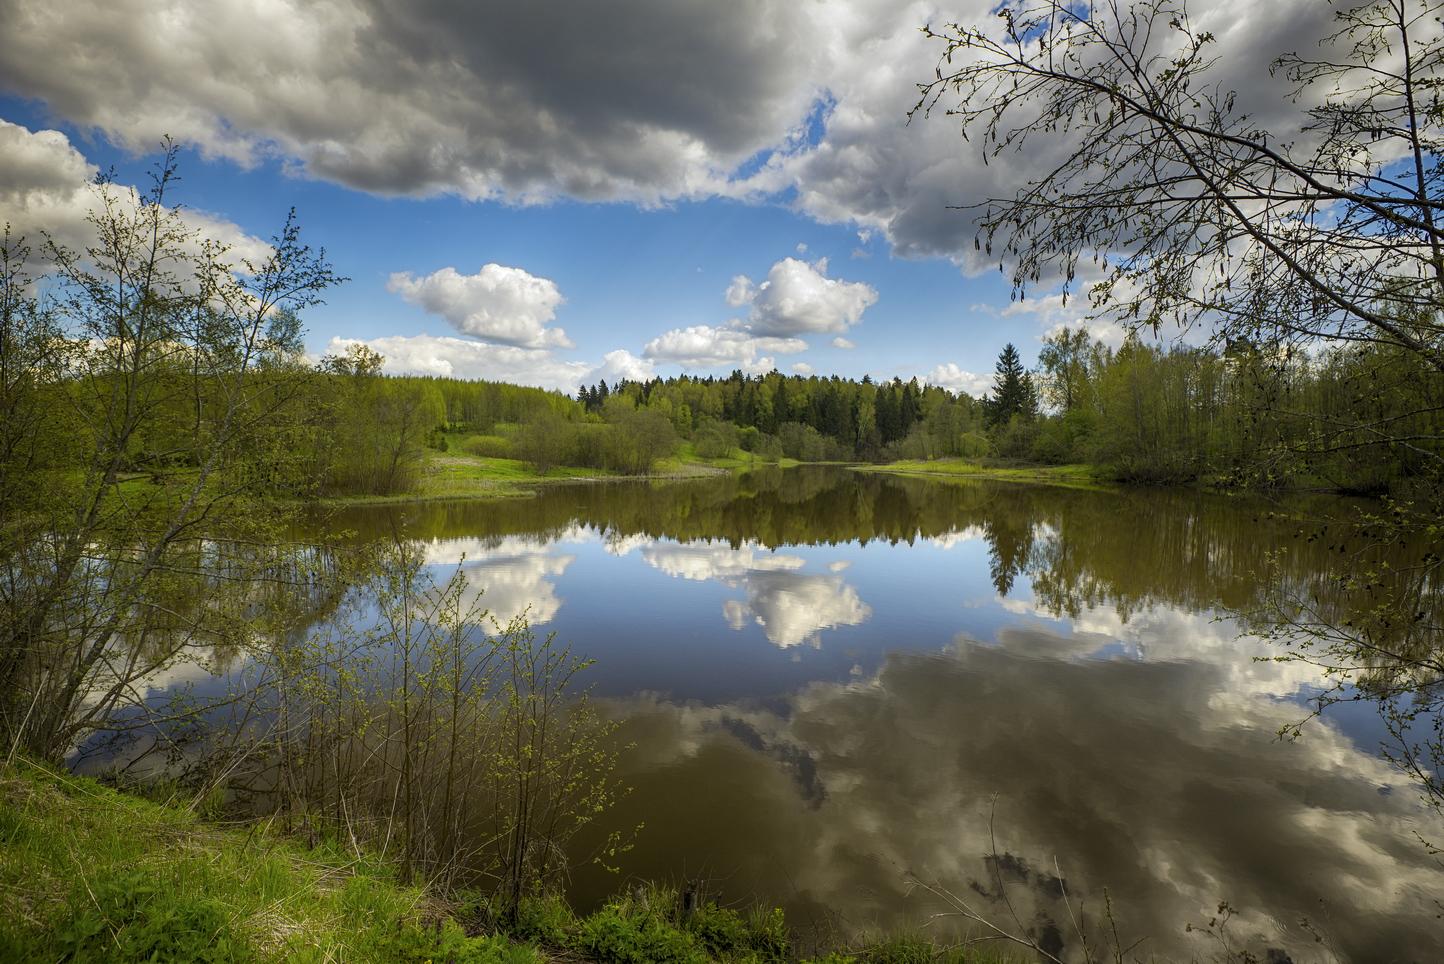 интерьеру река яхрома картинки чеченской